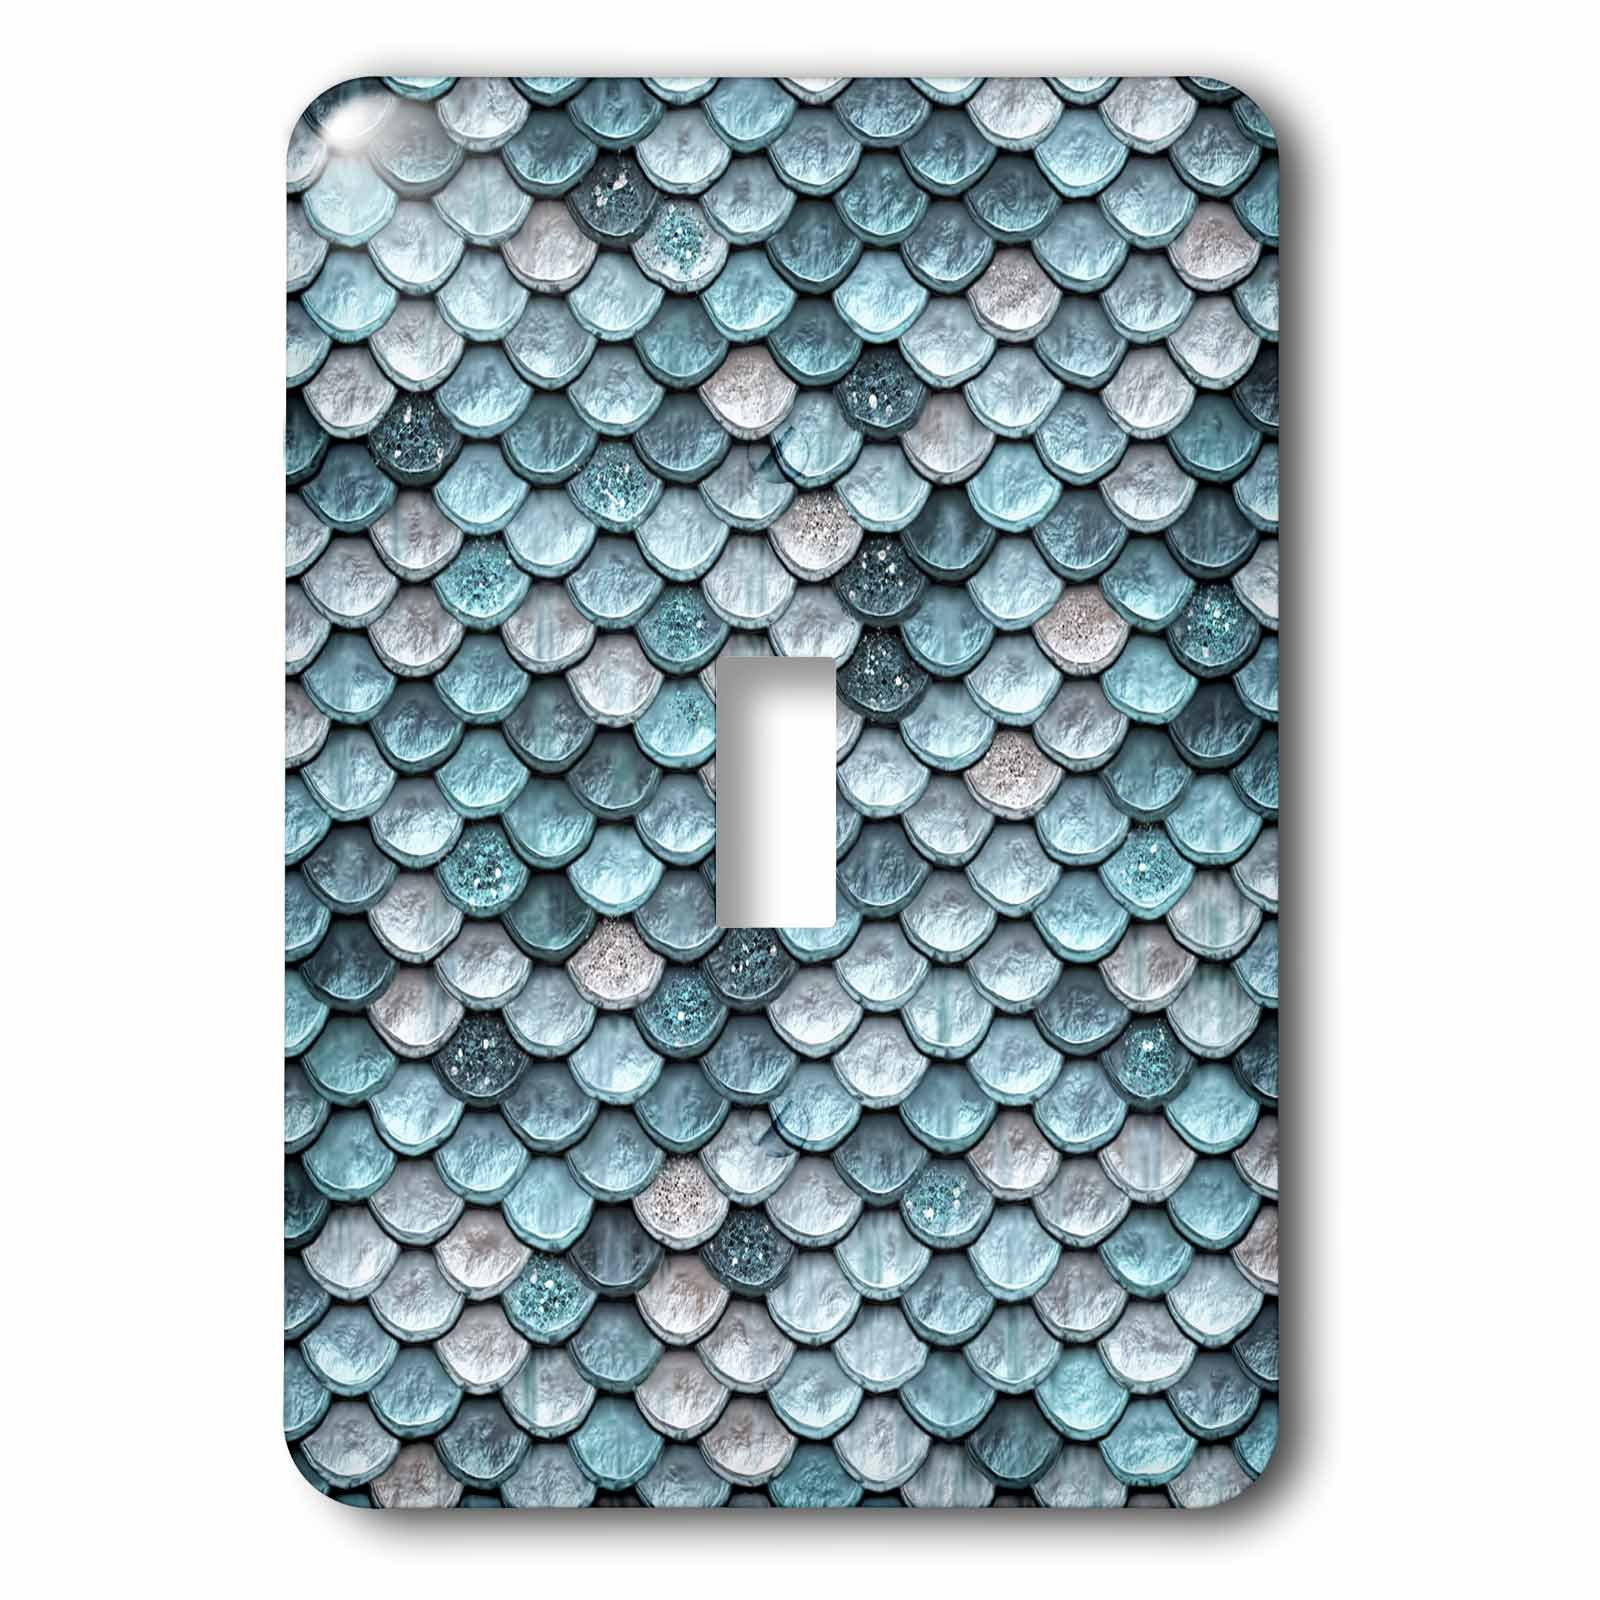 3dRose (lsp_267058_1) Single Toggle Switch (1) Sparkling Teal Luxury Elegant Mermaid Scales Glitter Effect Artprint